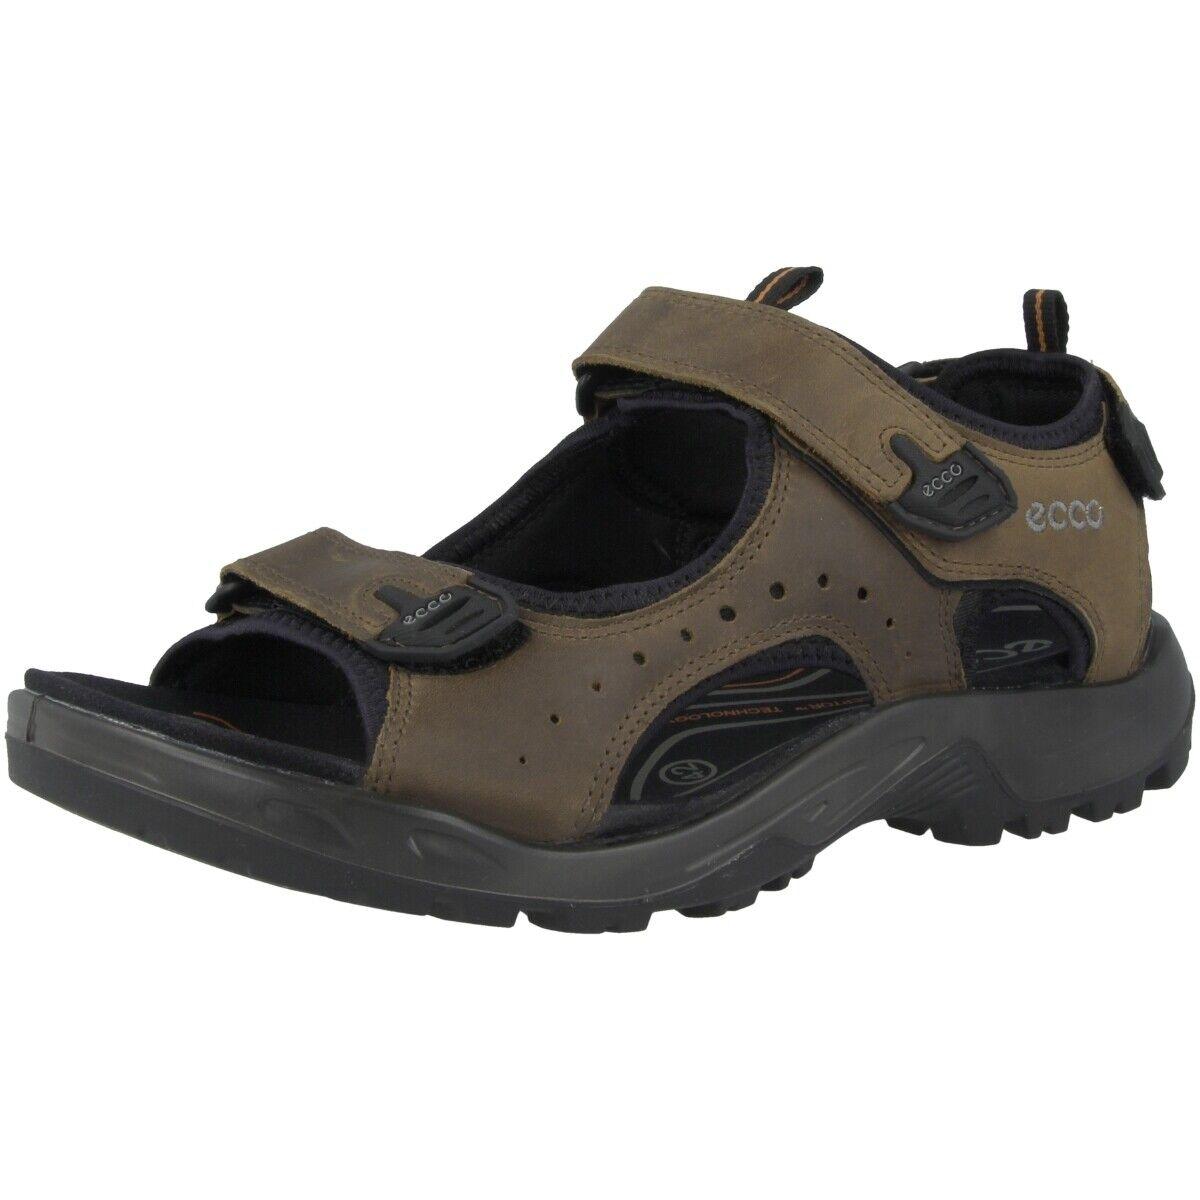 Ecco offroad Andes II sandal mens trekking hiking zapatos marrón